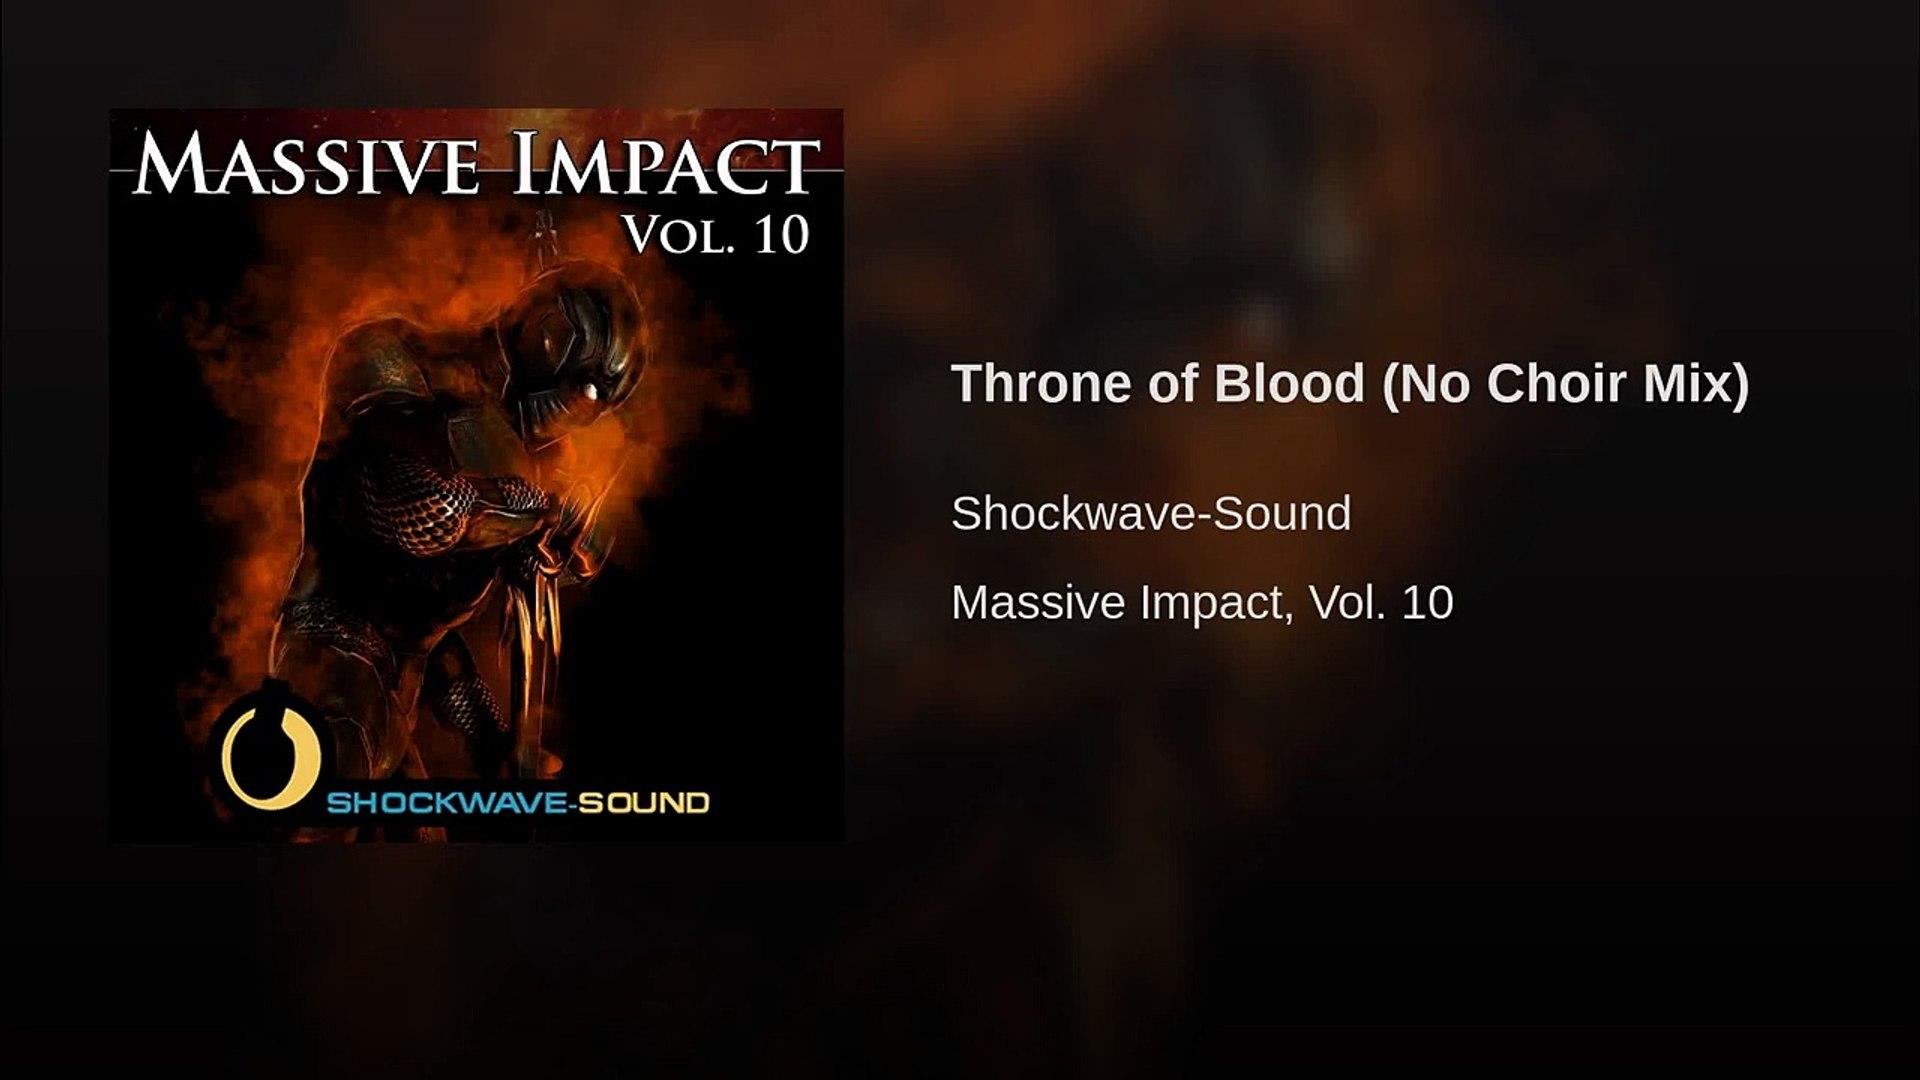 Throne of Blood (No Choir Mix)